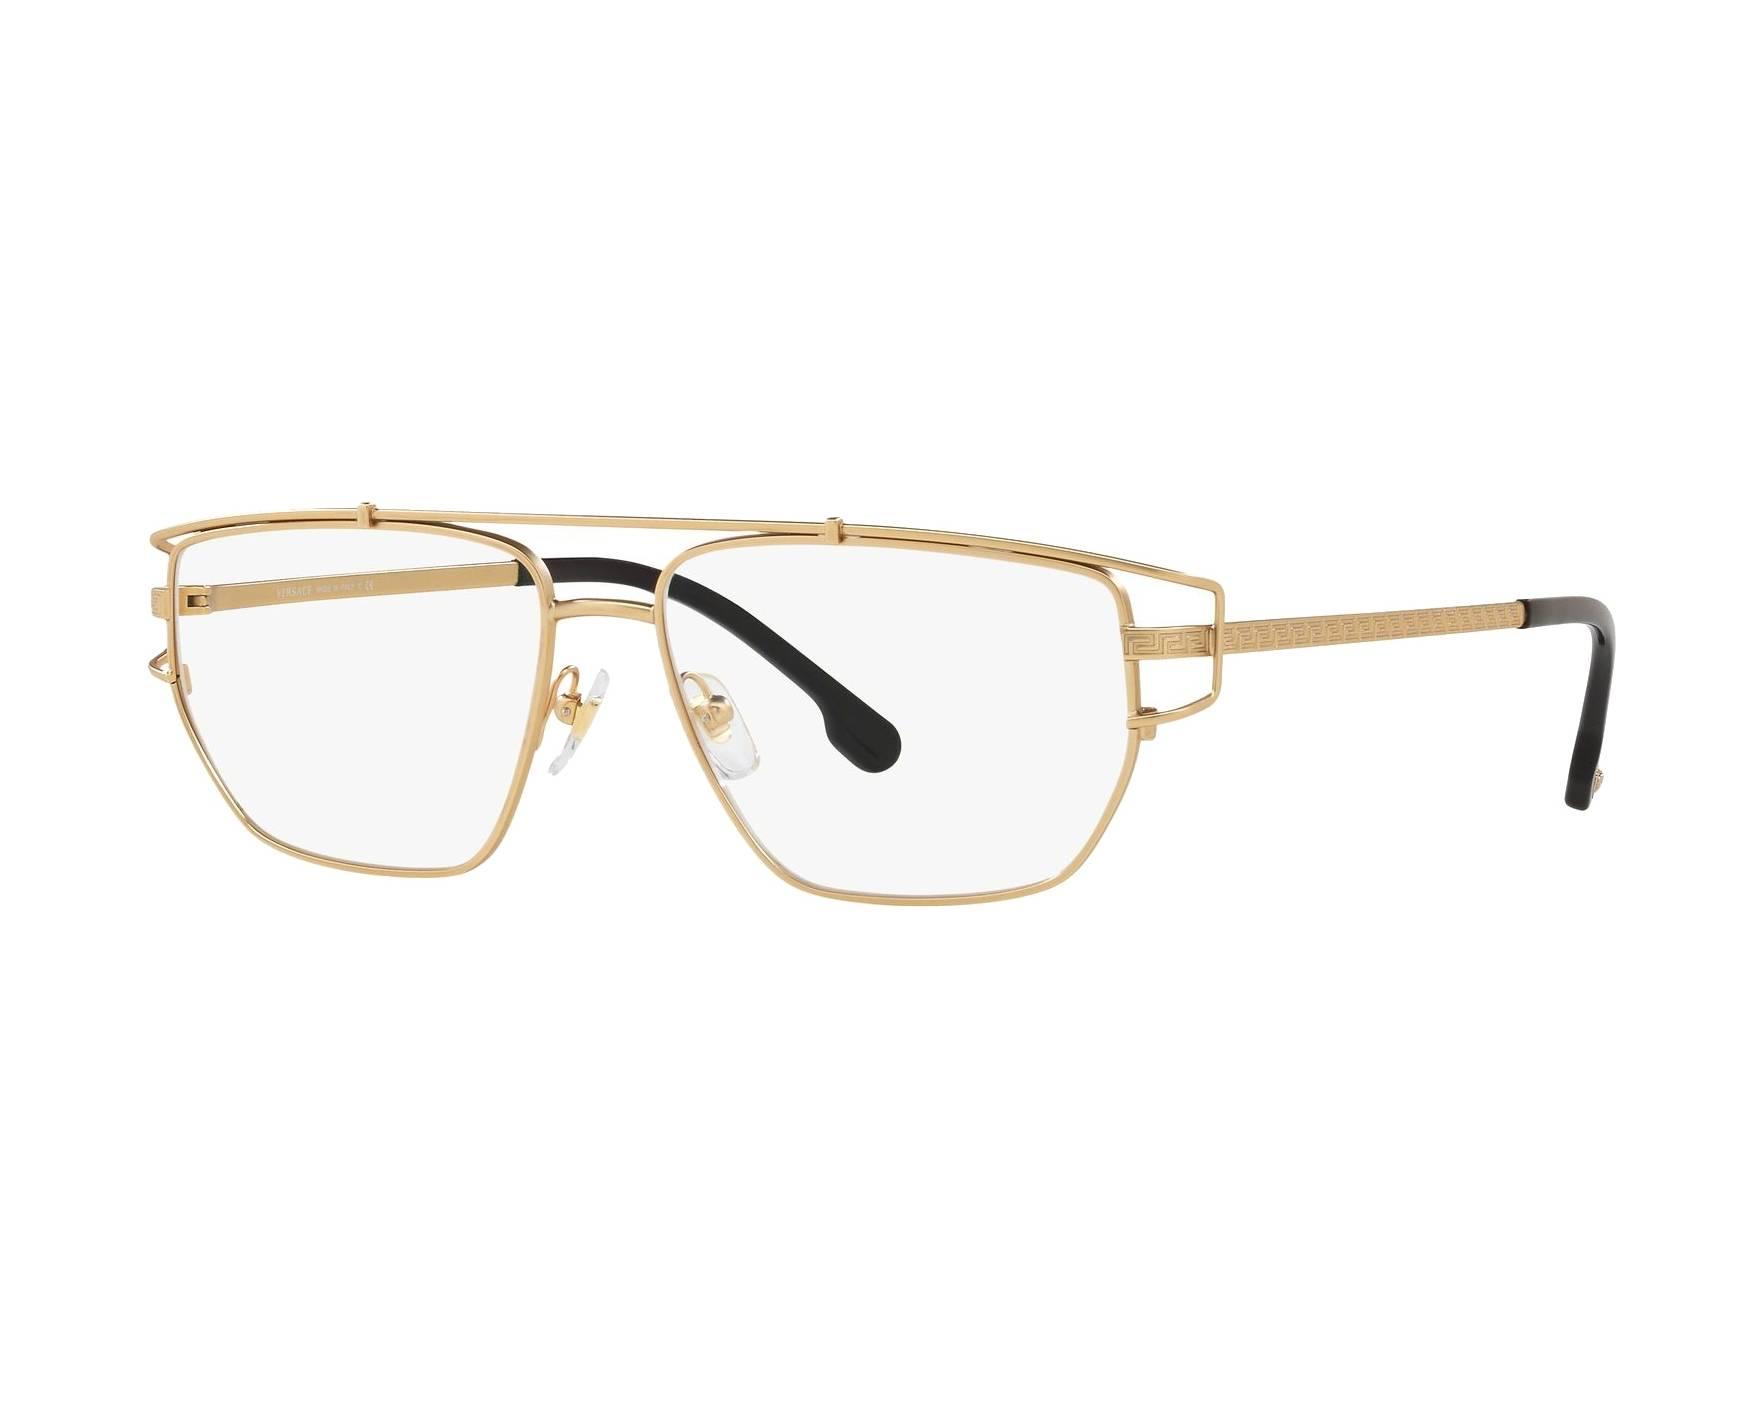 2c175a5faed eyeglasses Versace VE-1257 1410 55-15 Gold